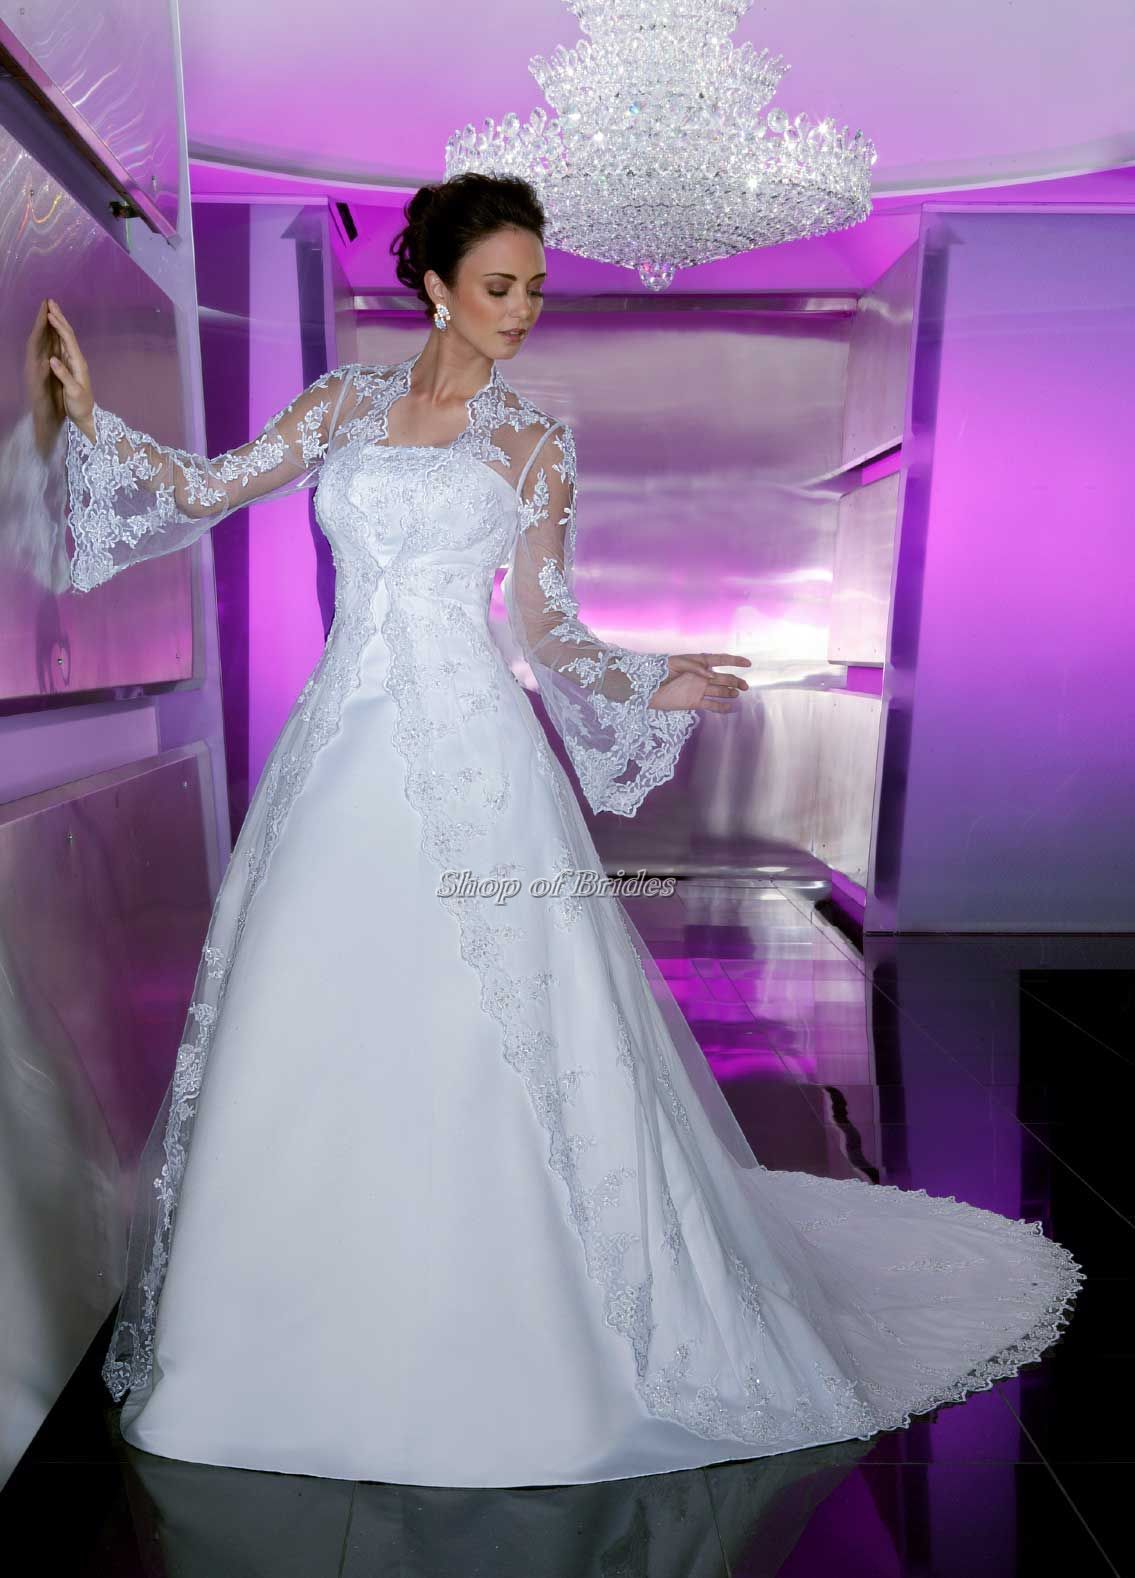 Wedding Dresses With Sleeve | Wedding Dresses With Sleeve ...